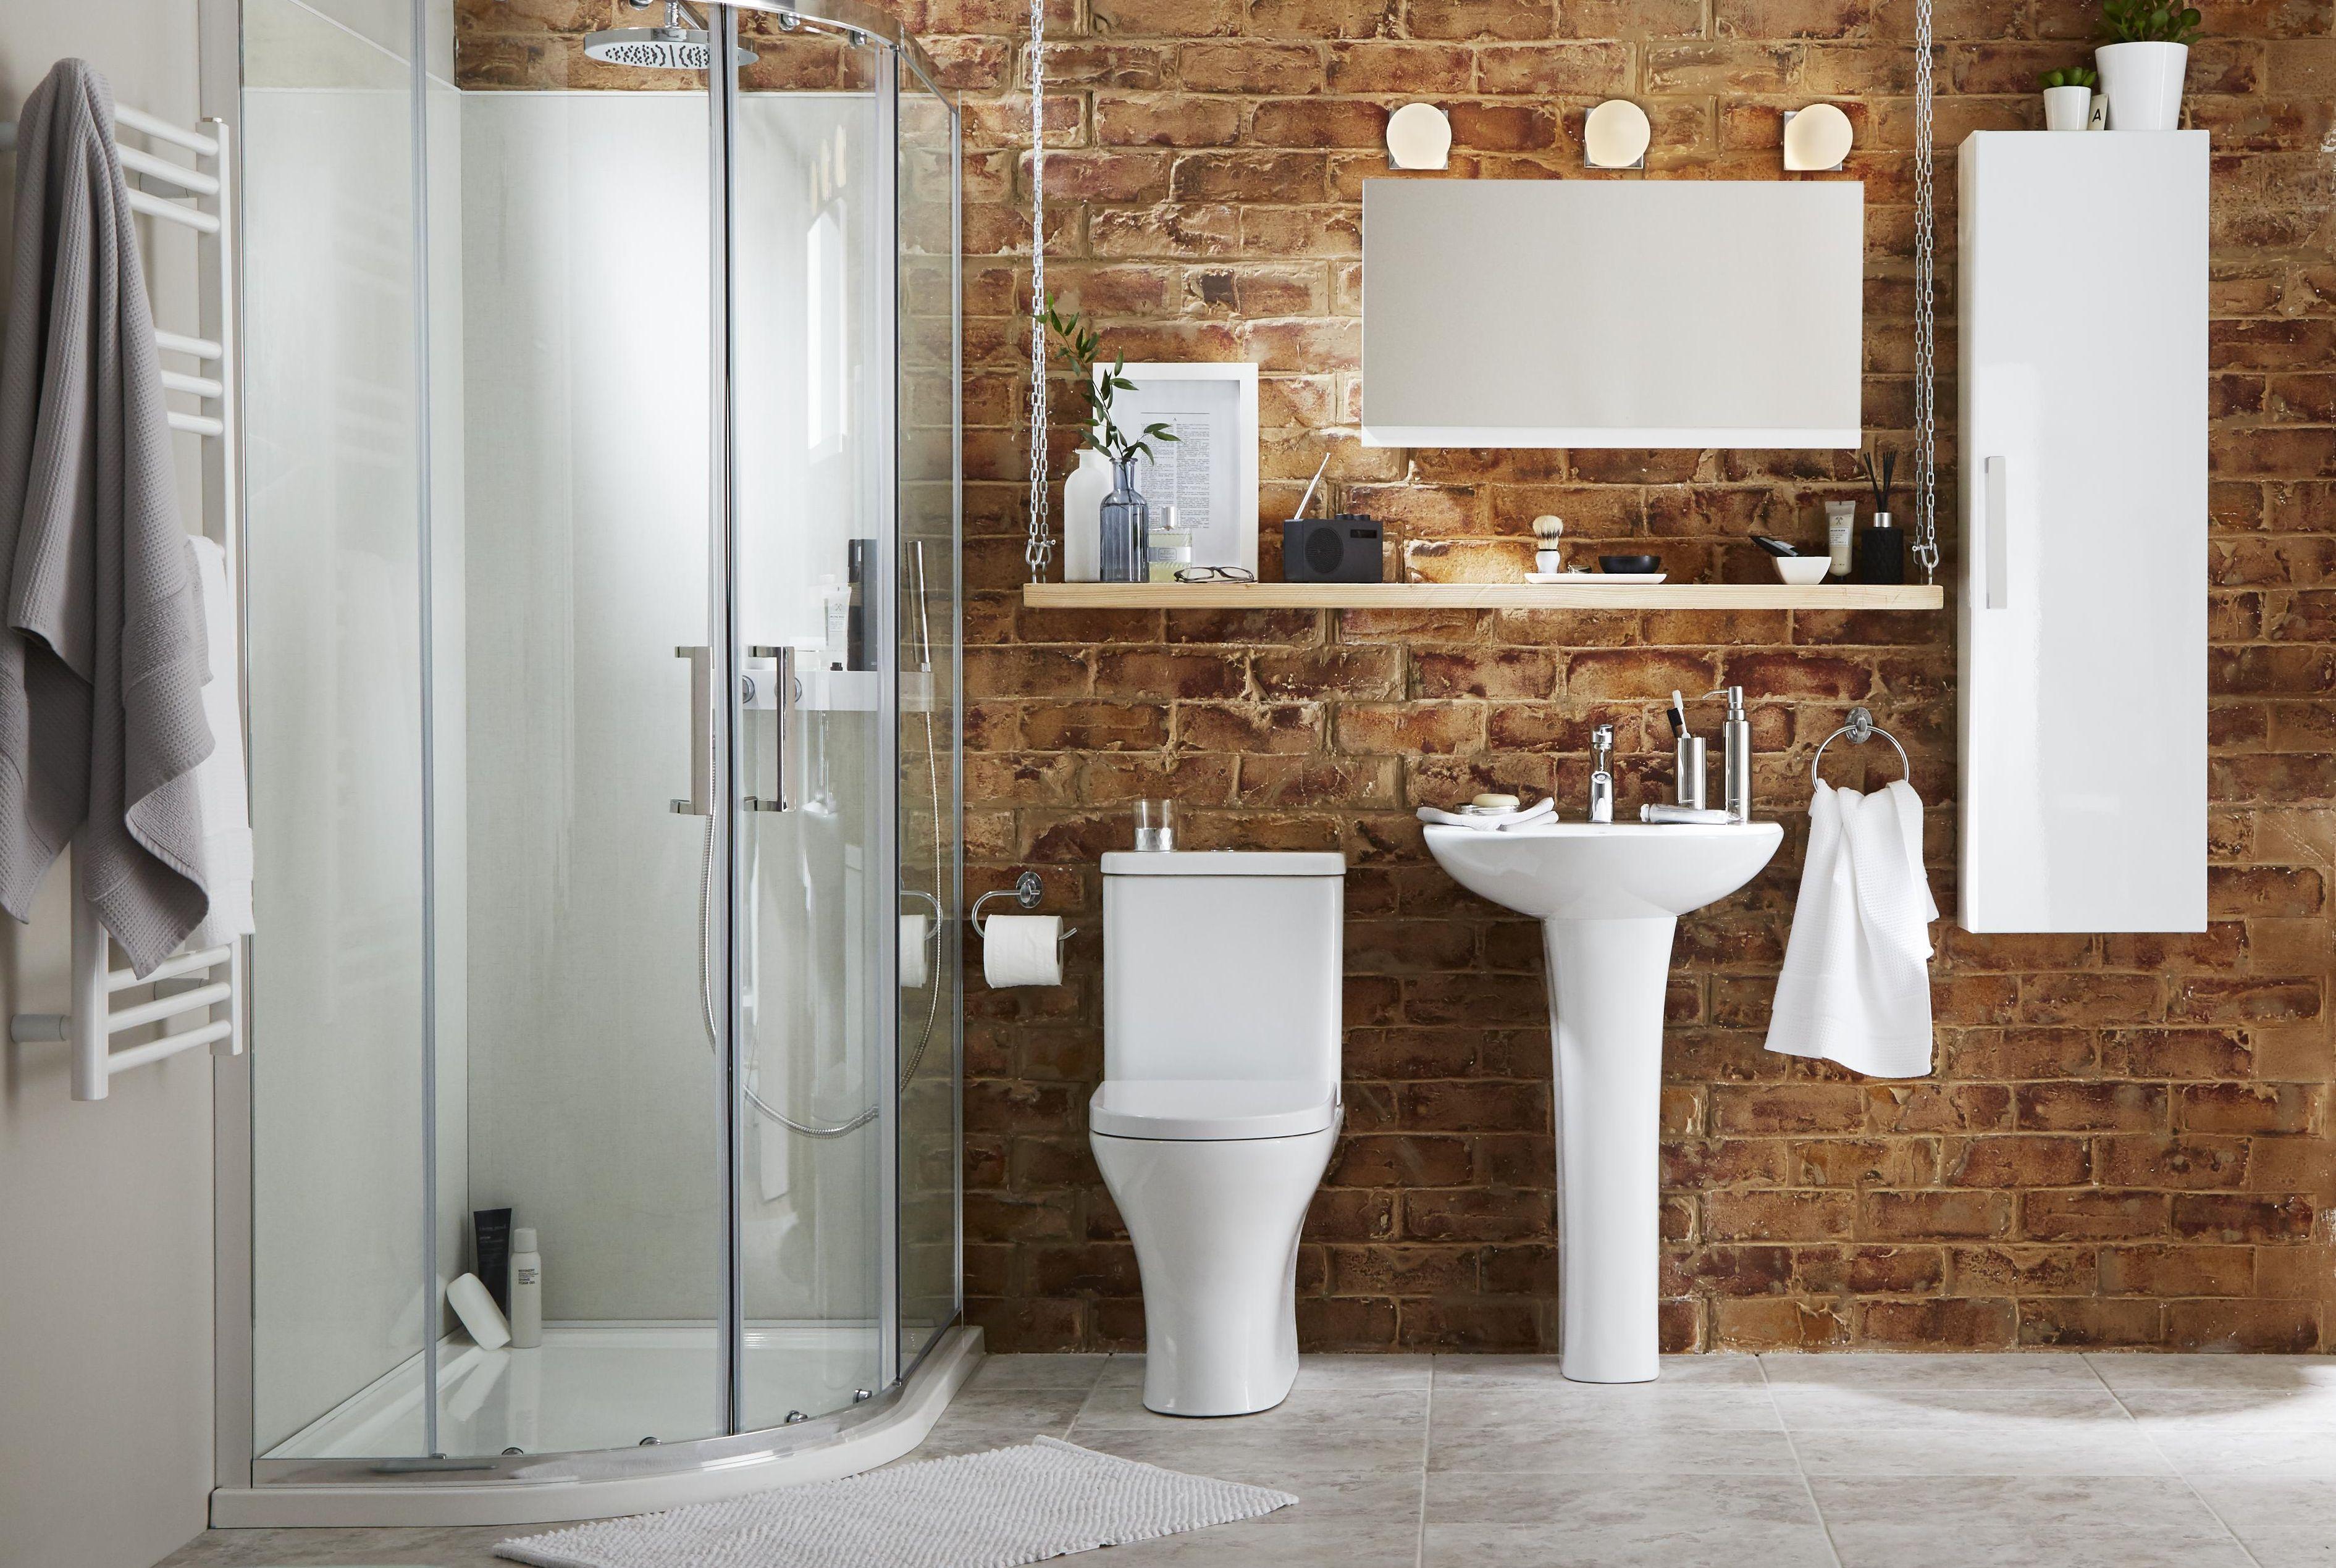 Bathroom Suites plete Bathroom Suites